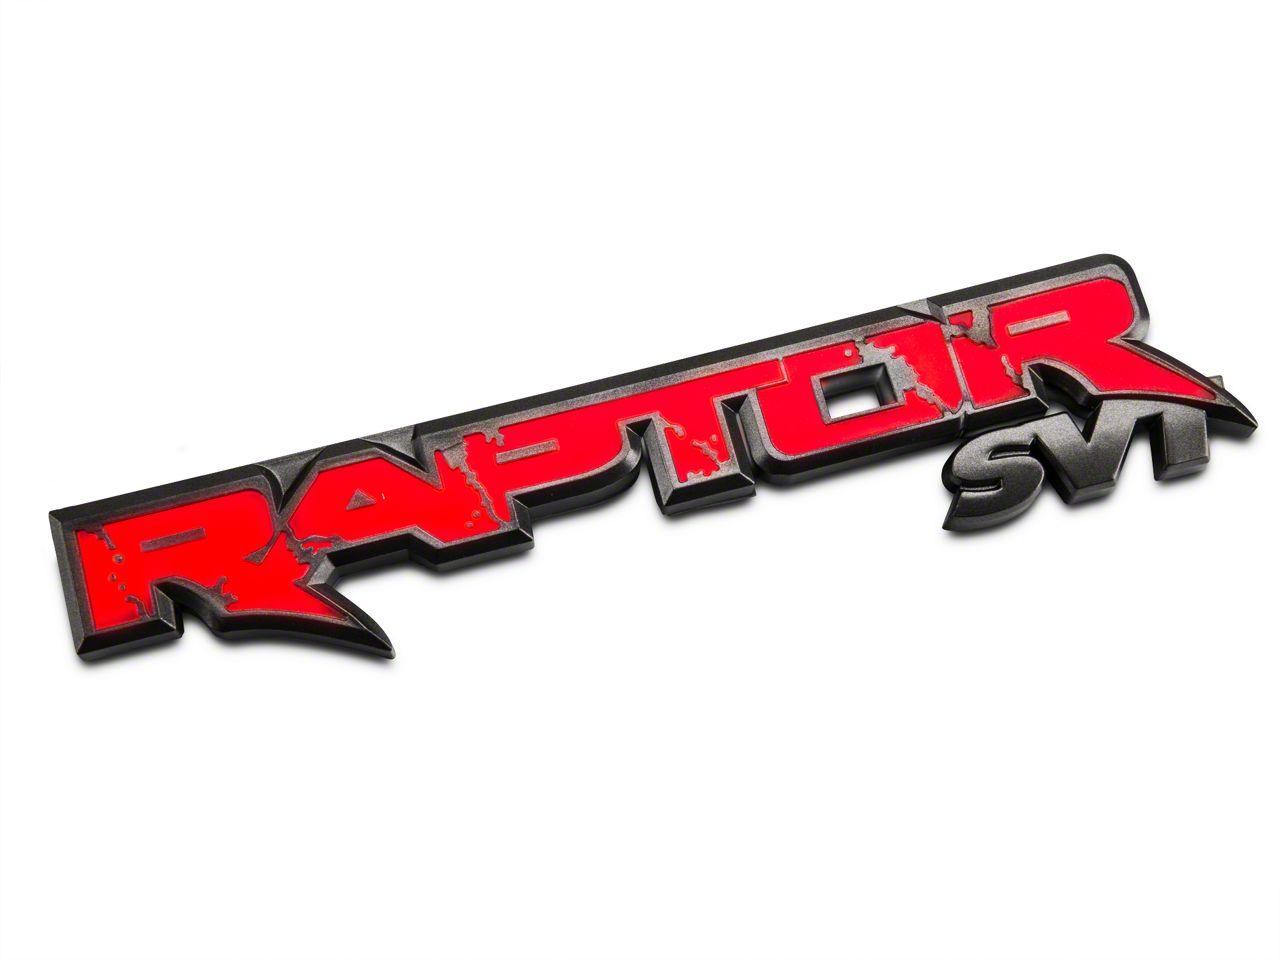 Recon Illuminated Rear Tailgate Emblem - w/ Red Illumination (10-14 F-150 Raptor)